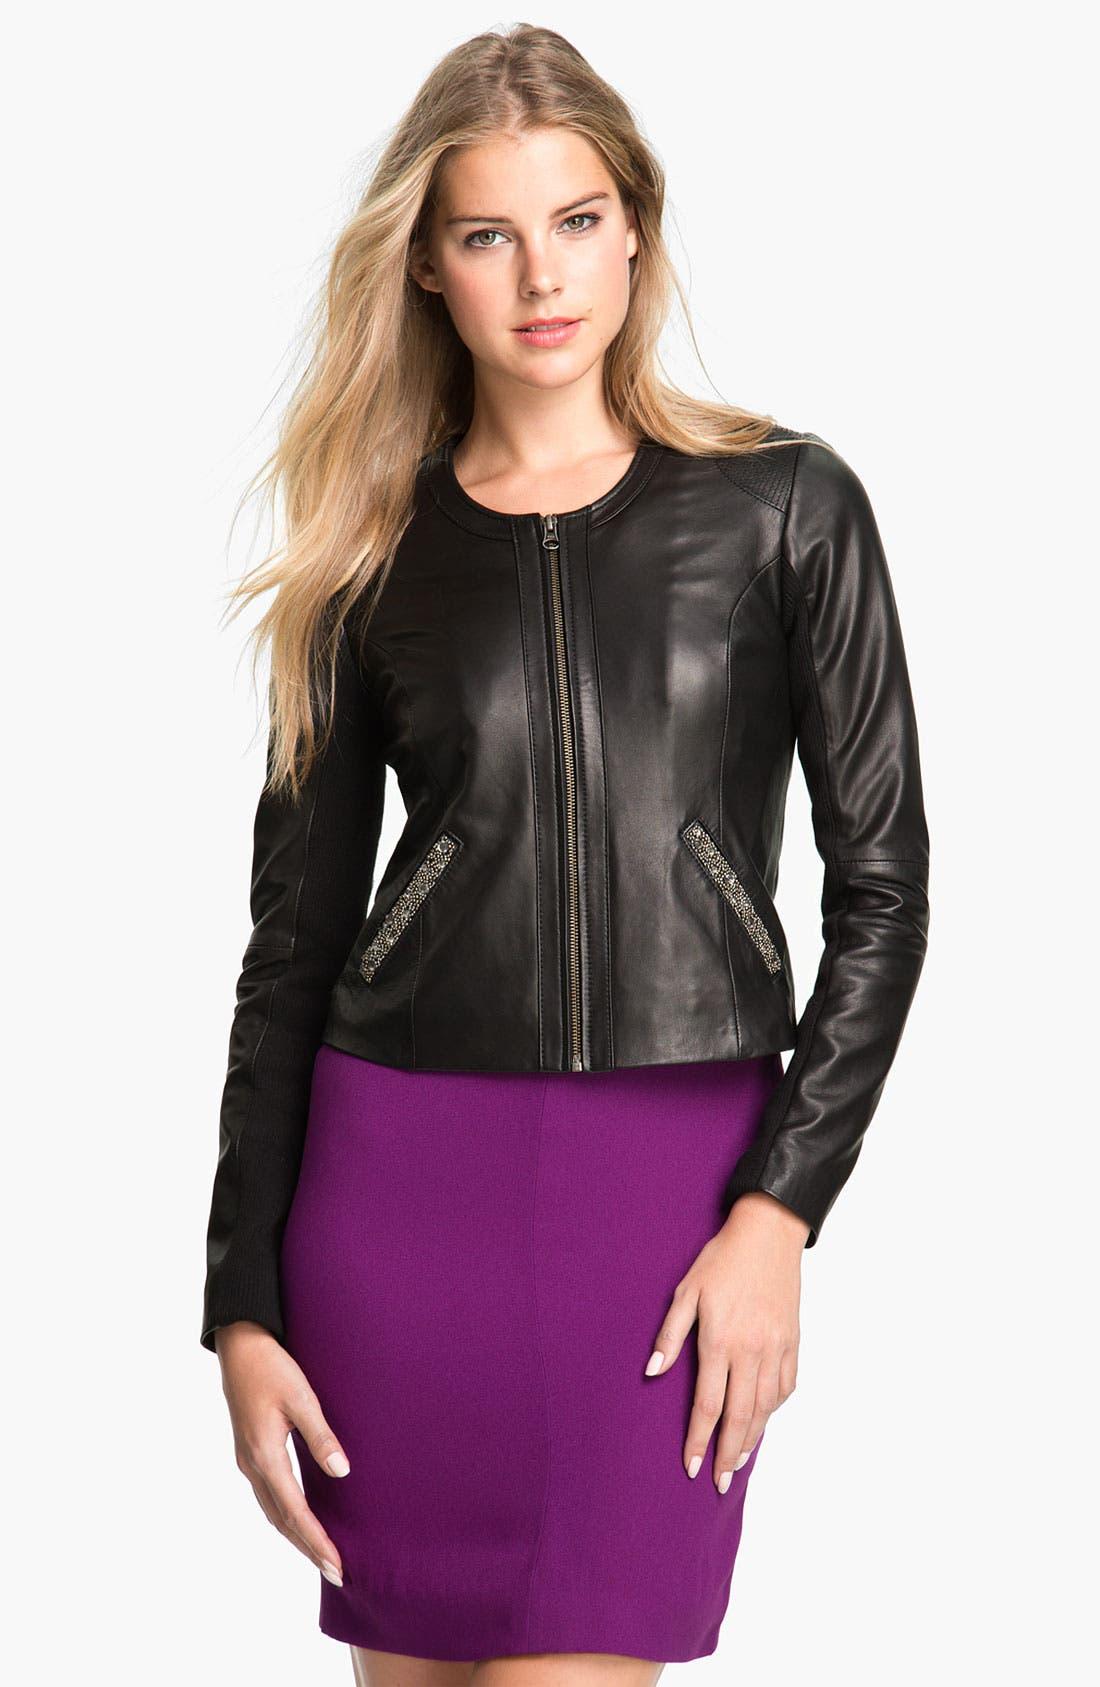 Alternate Image 1 Selected - Badgley Mischka 'Ellie' Beaded Leather Jacket